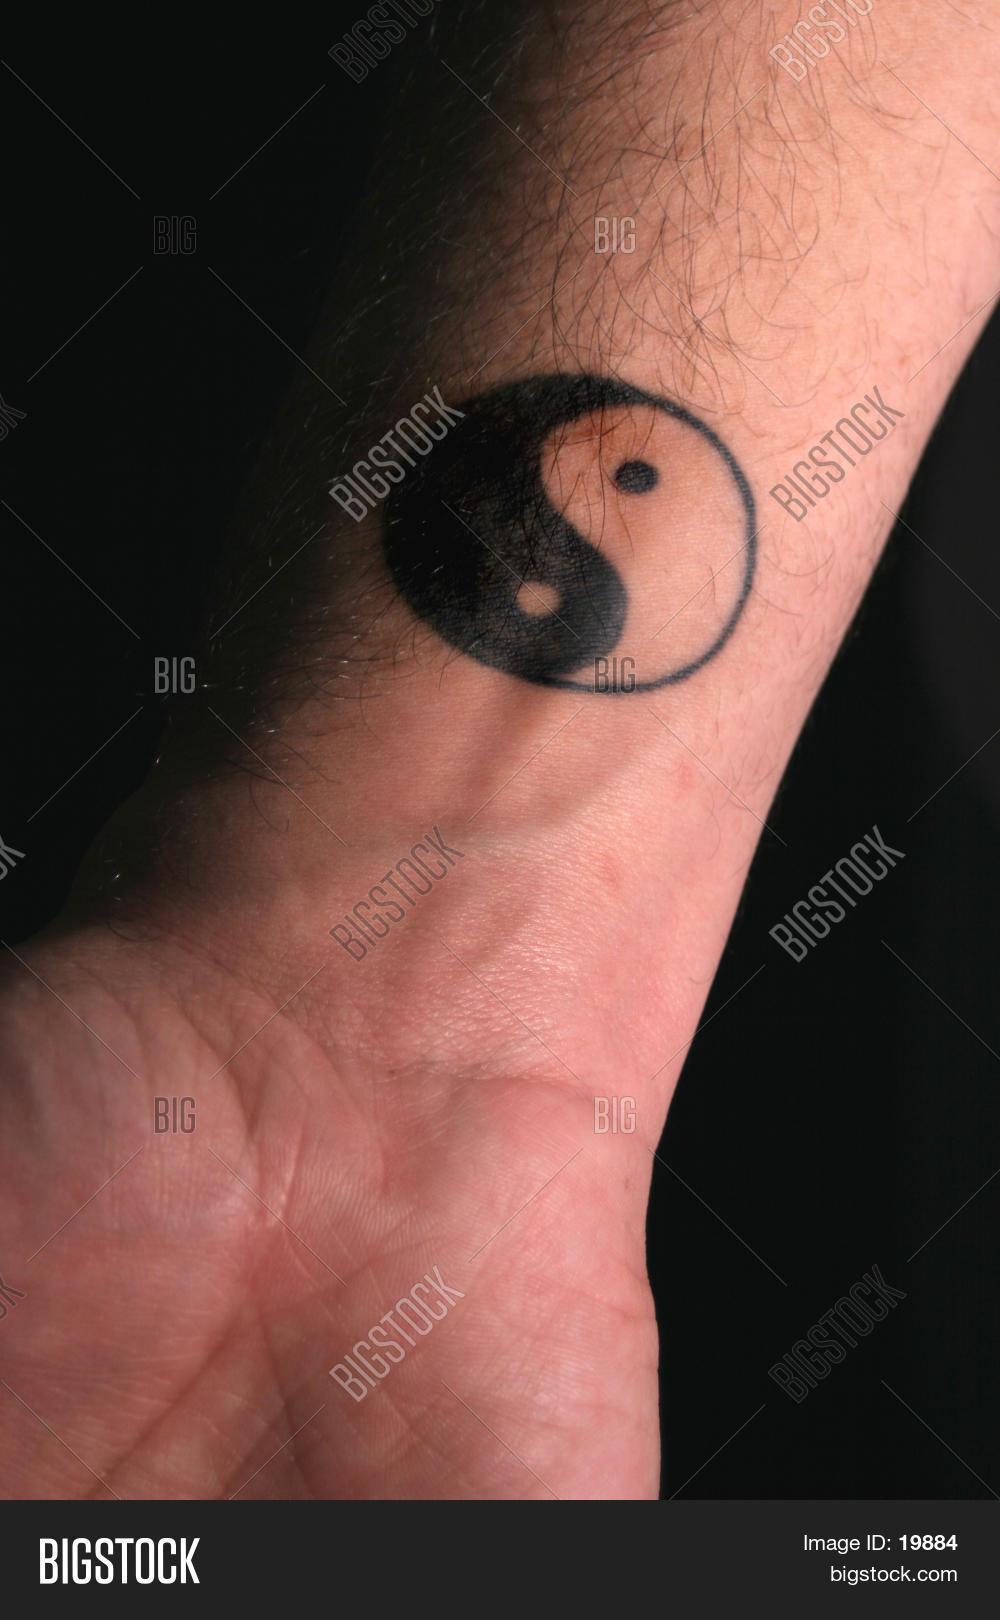 Yin Yang Tattoo On Arm Stock Photo & Stock Images | Bigstock